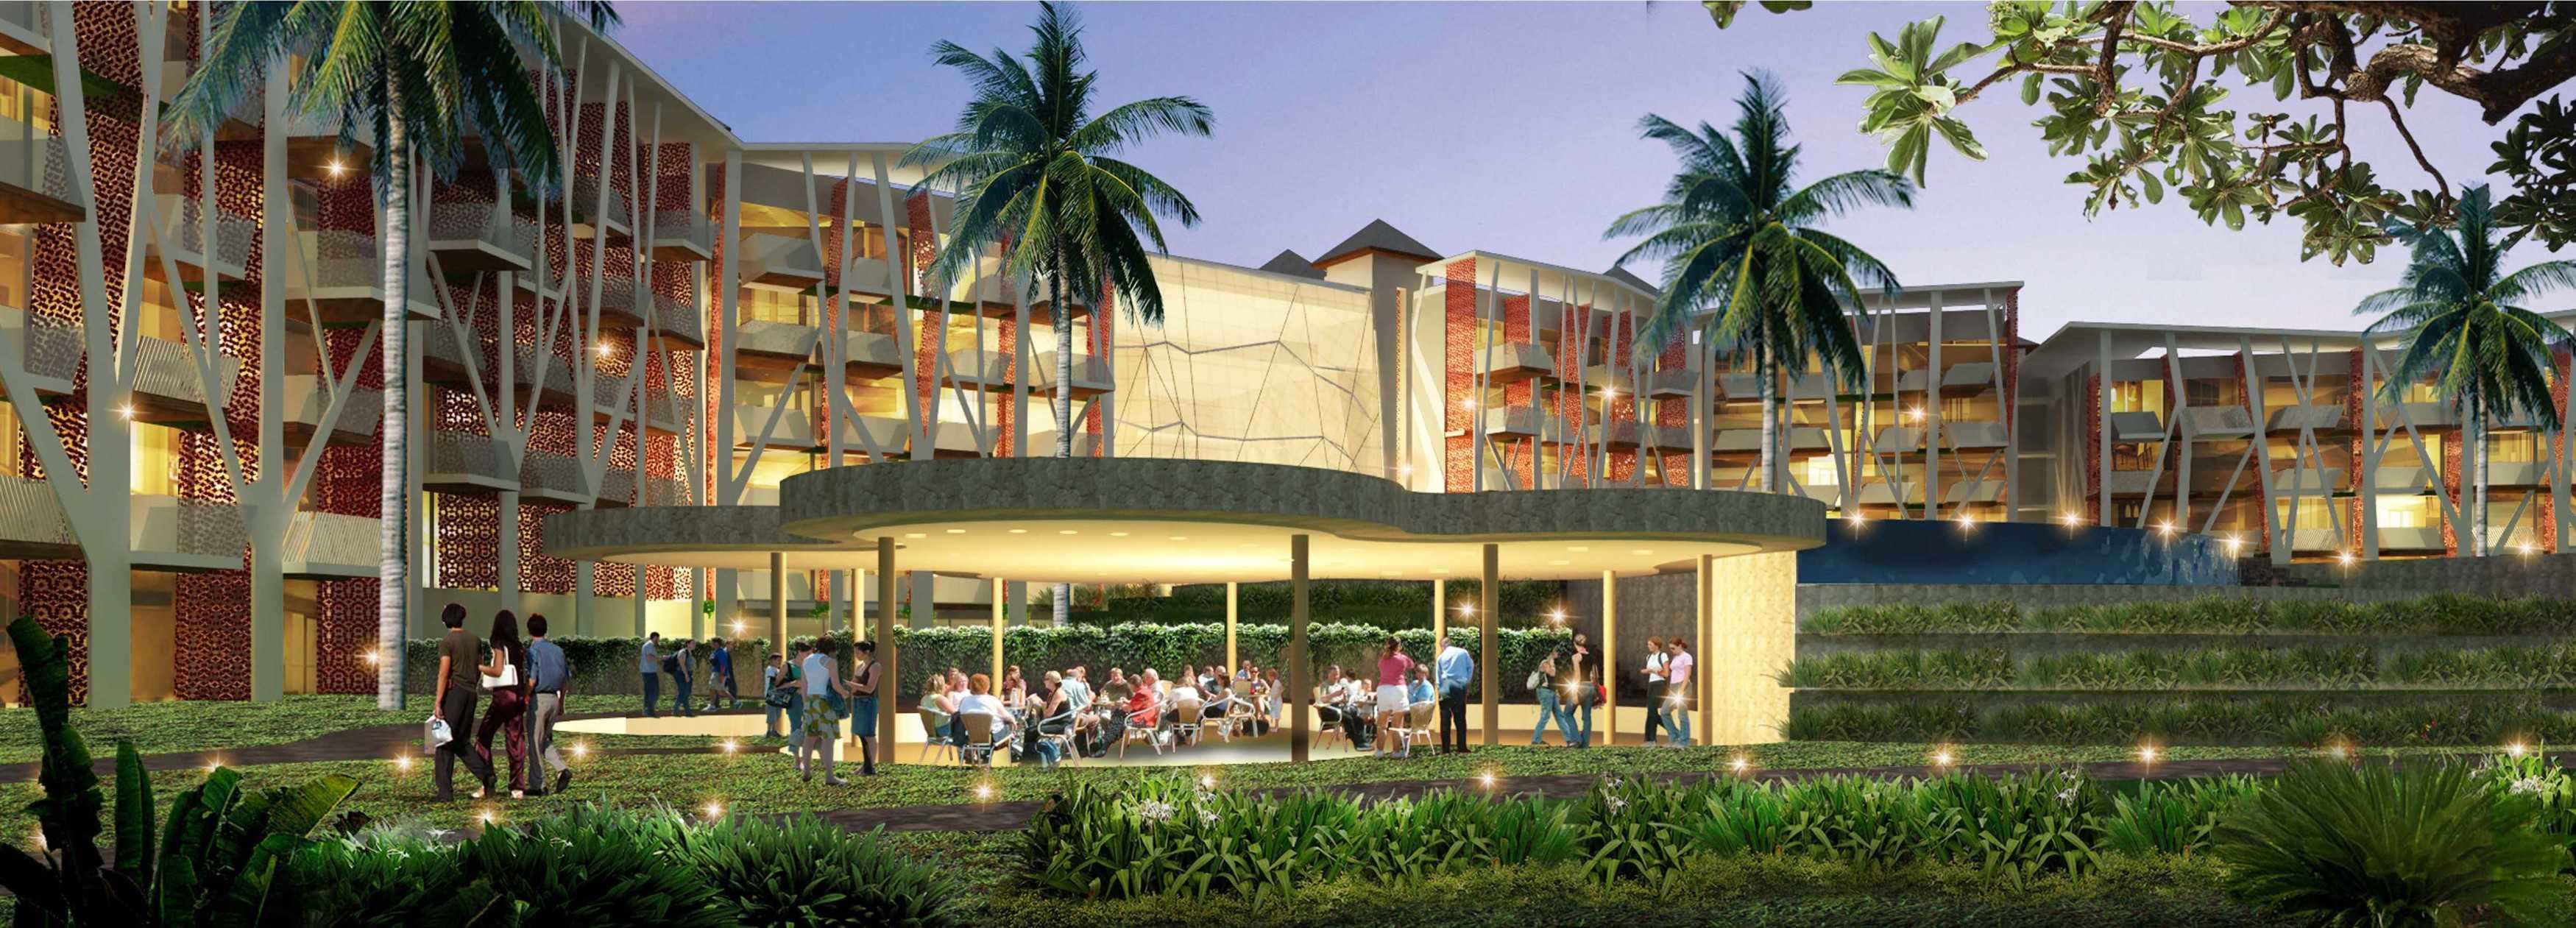 Mikael Wahyu Hotel Pecatu Bali Bali Speciality-Restaurant-Perspective   26057